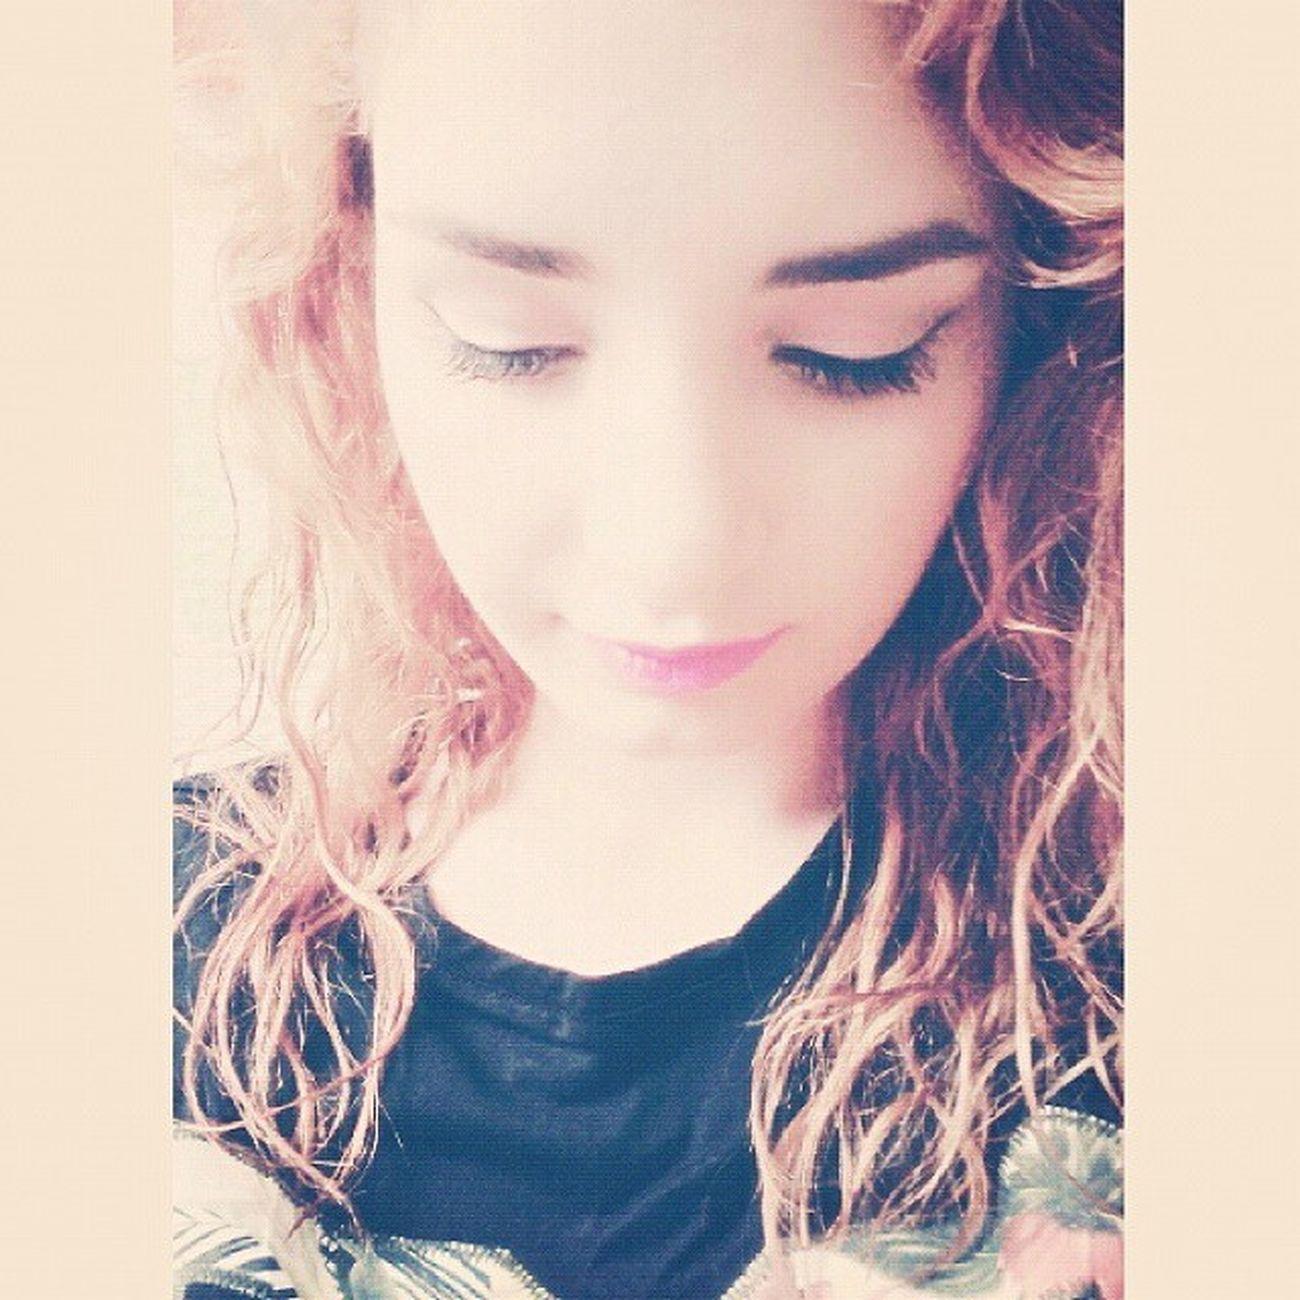 D R E A M S Waiting Me im Coming Korea Work Hard Iwillgetwhatiwant IHope Turkishgirl Eyeliner Eye Orangehair Jonginismybias Mybiasisjongin Jonginismine Kimkai